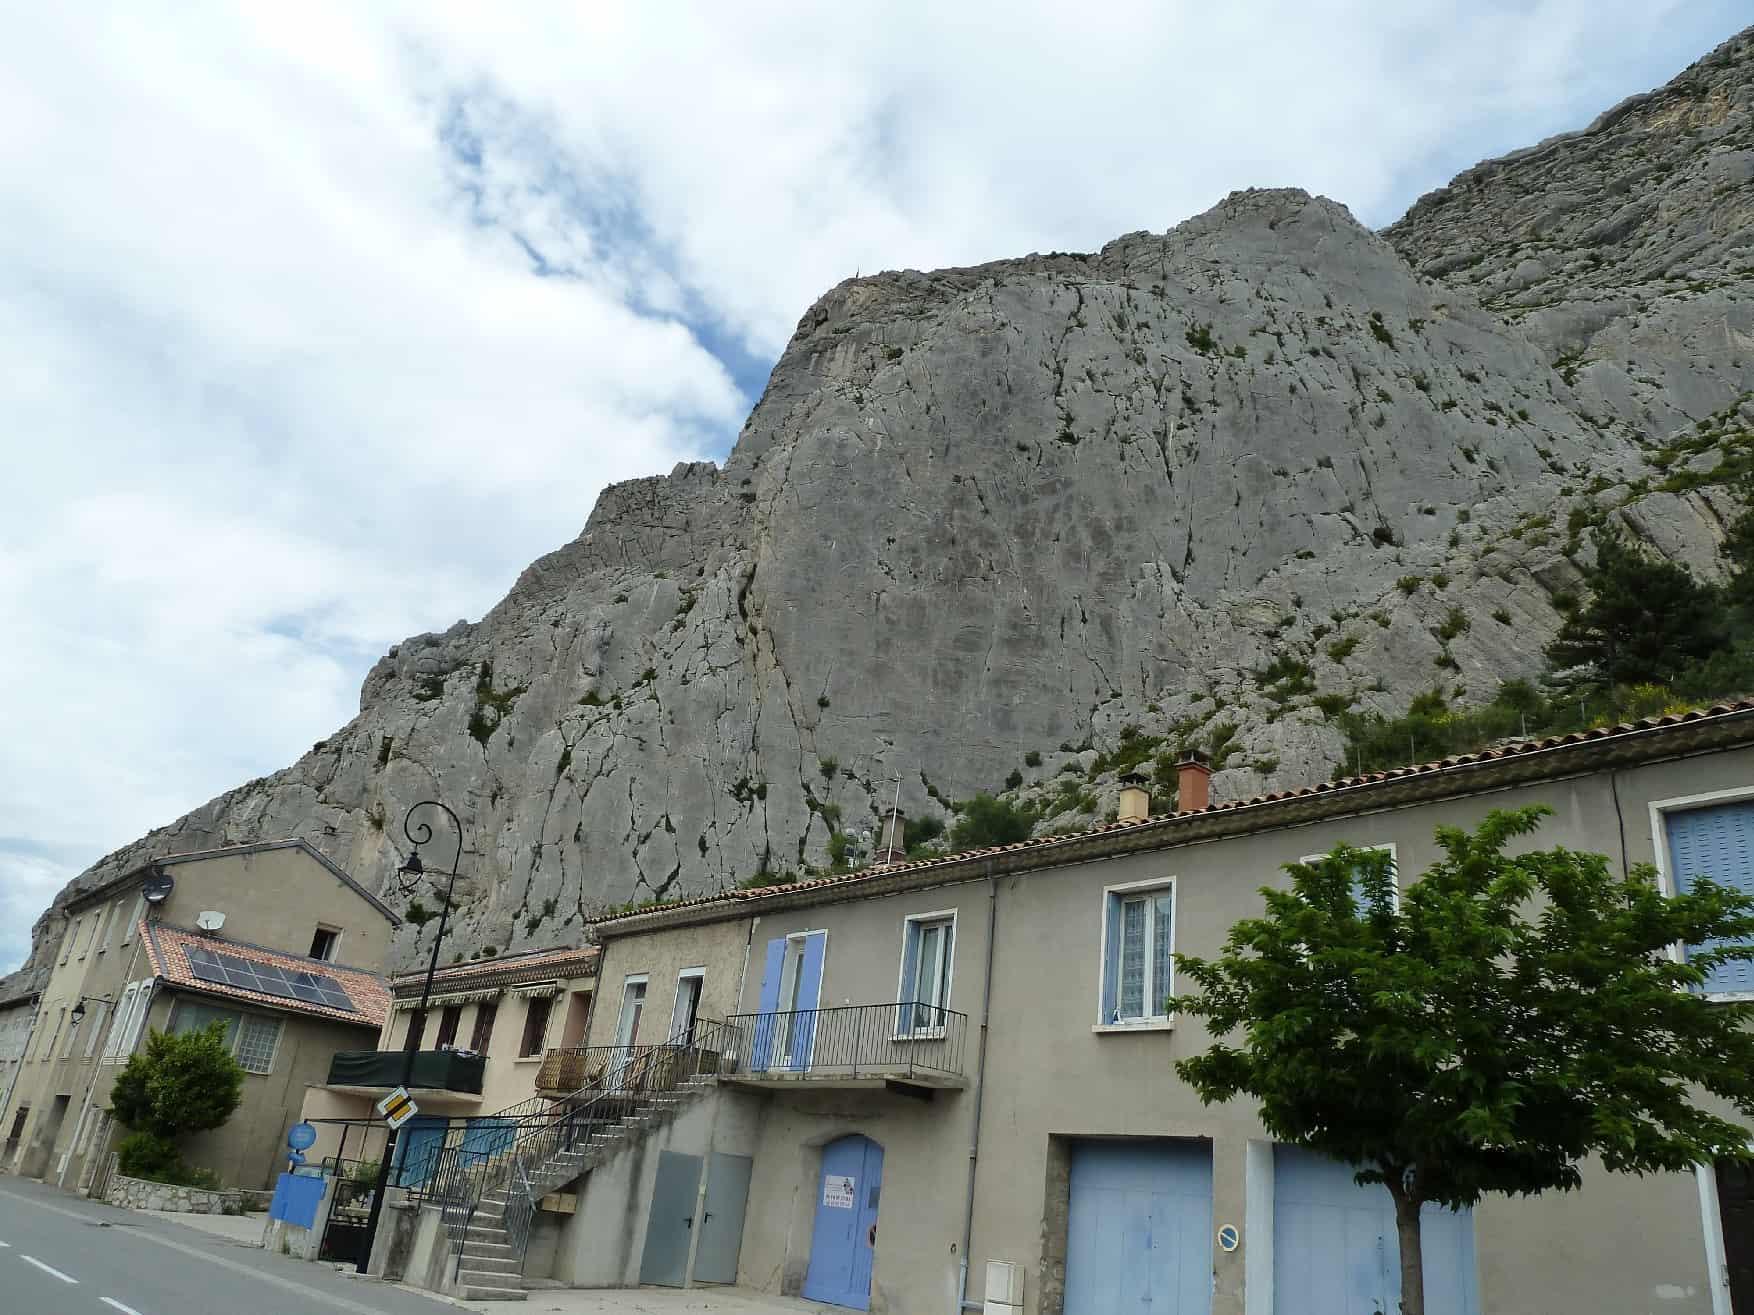 Klettern bei Sisteron